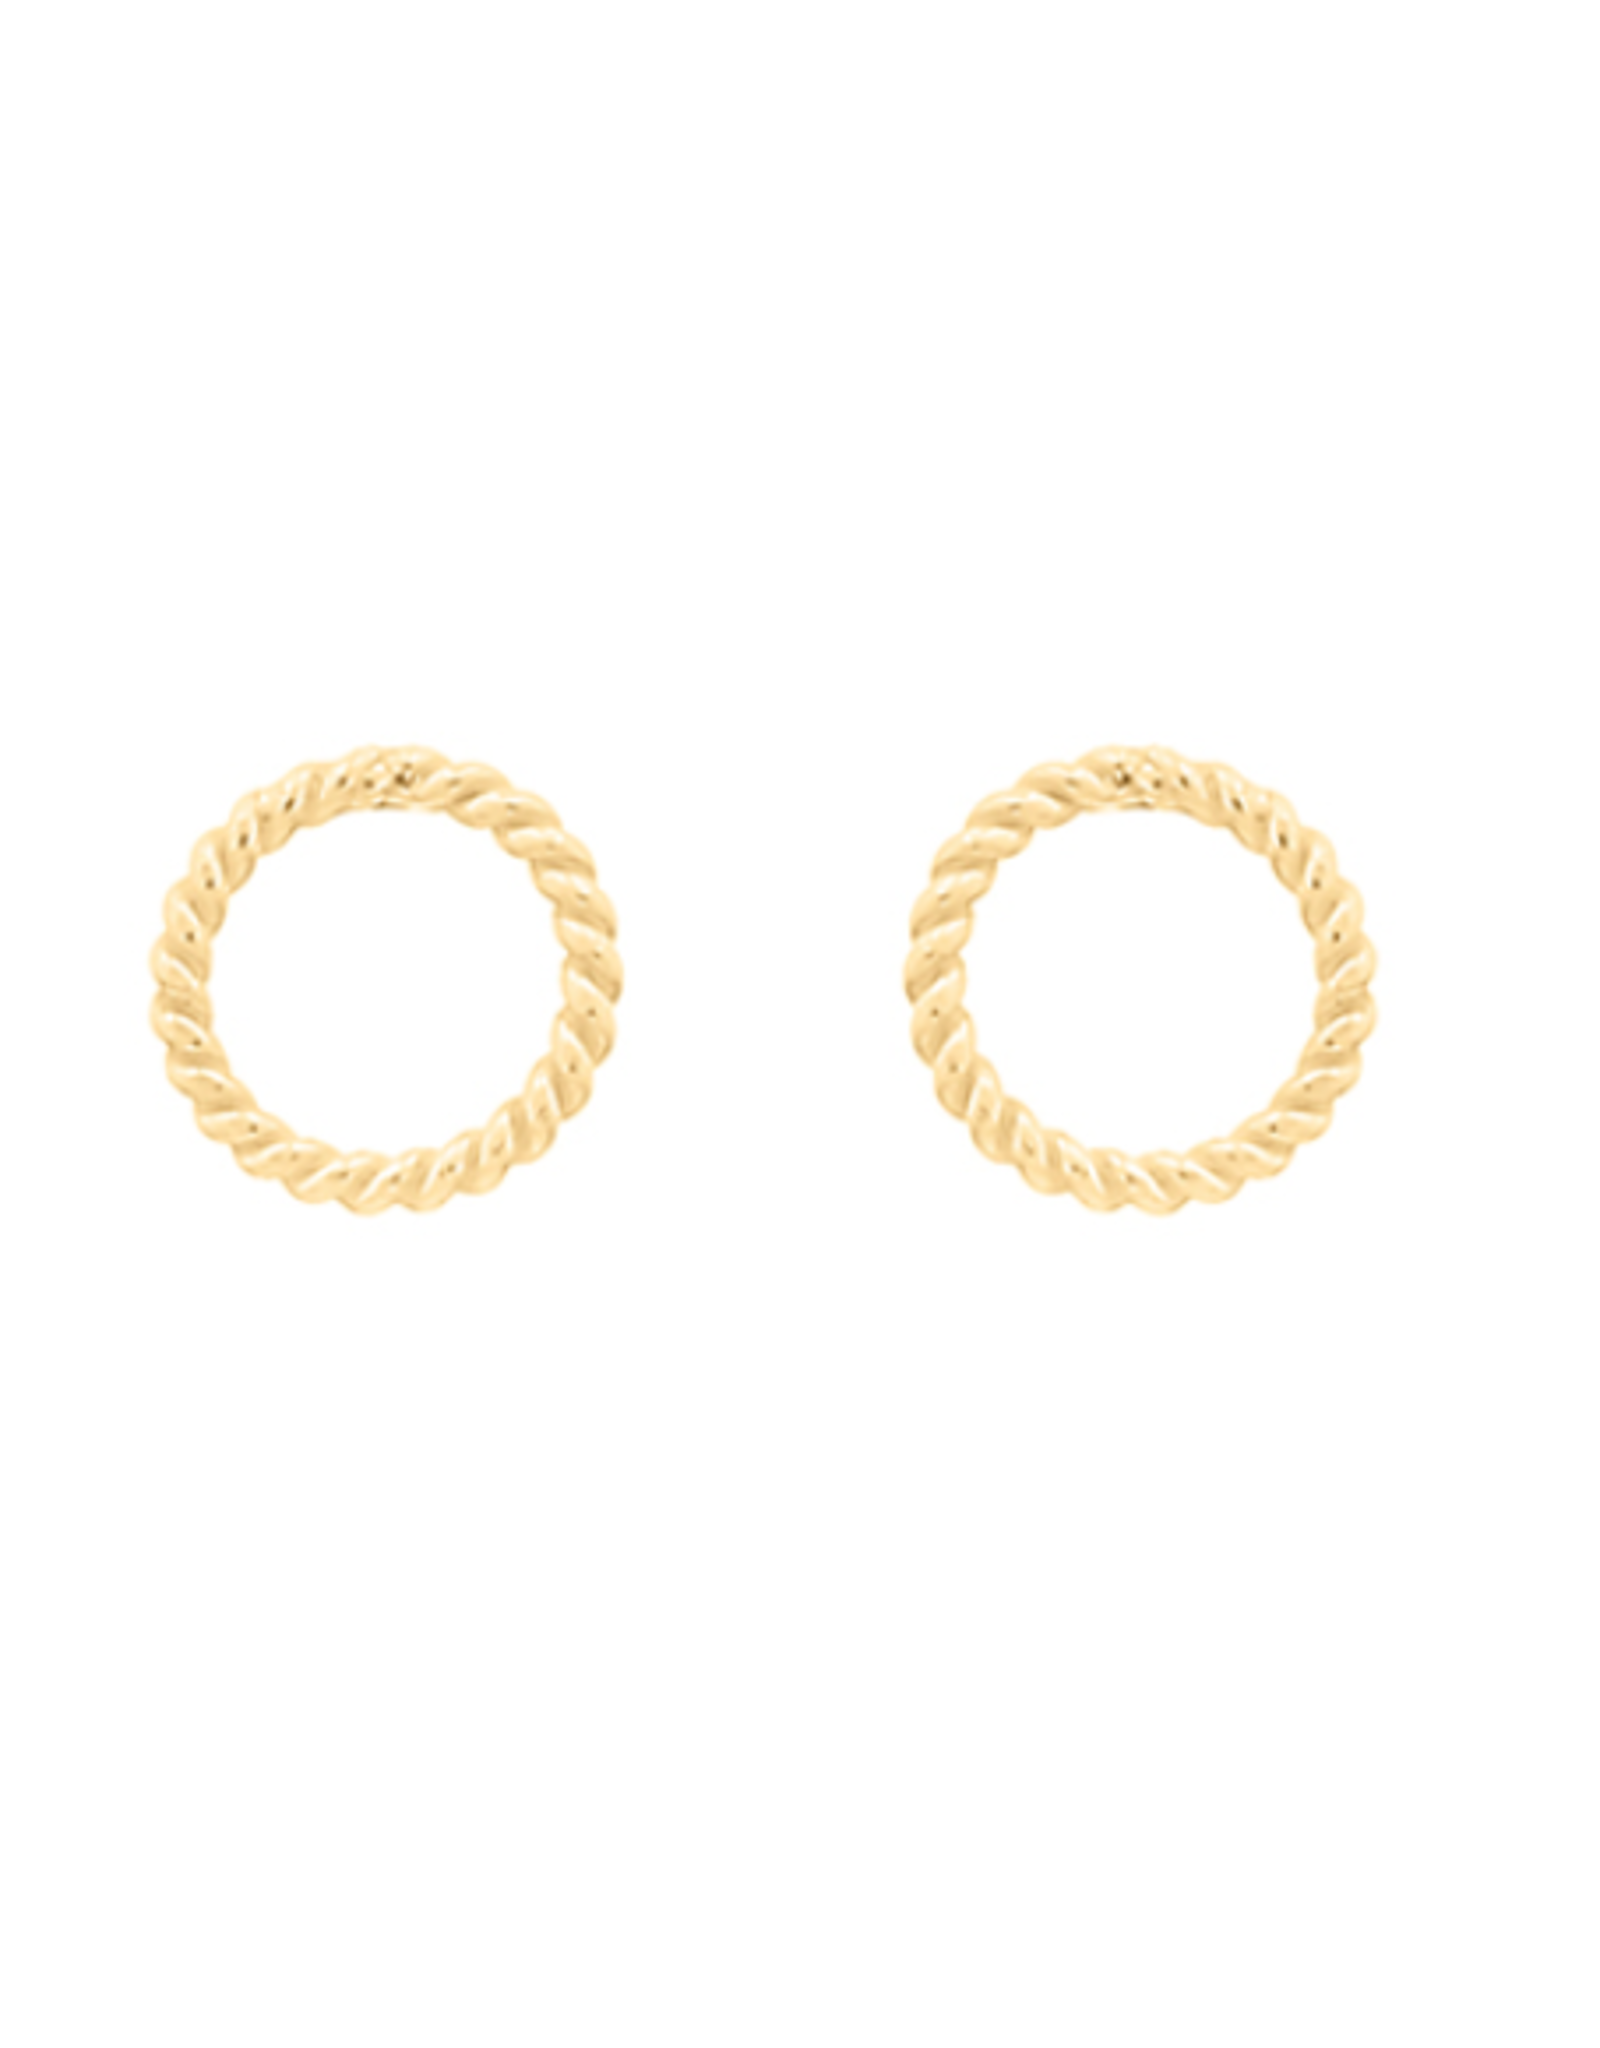 Miab Miab - Oorbellen goud - mini circle